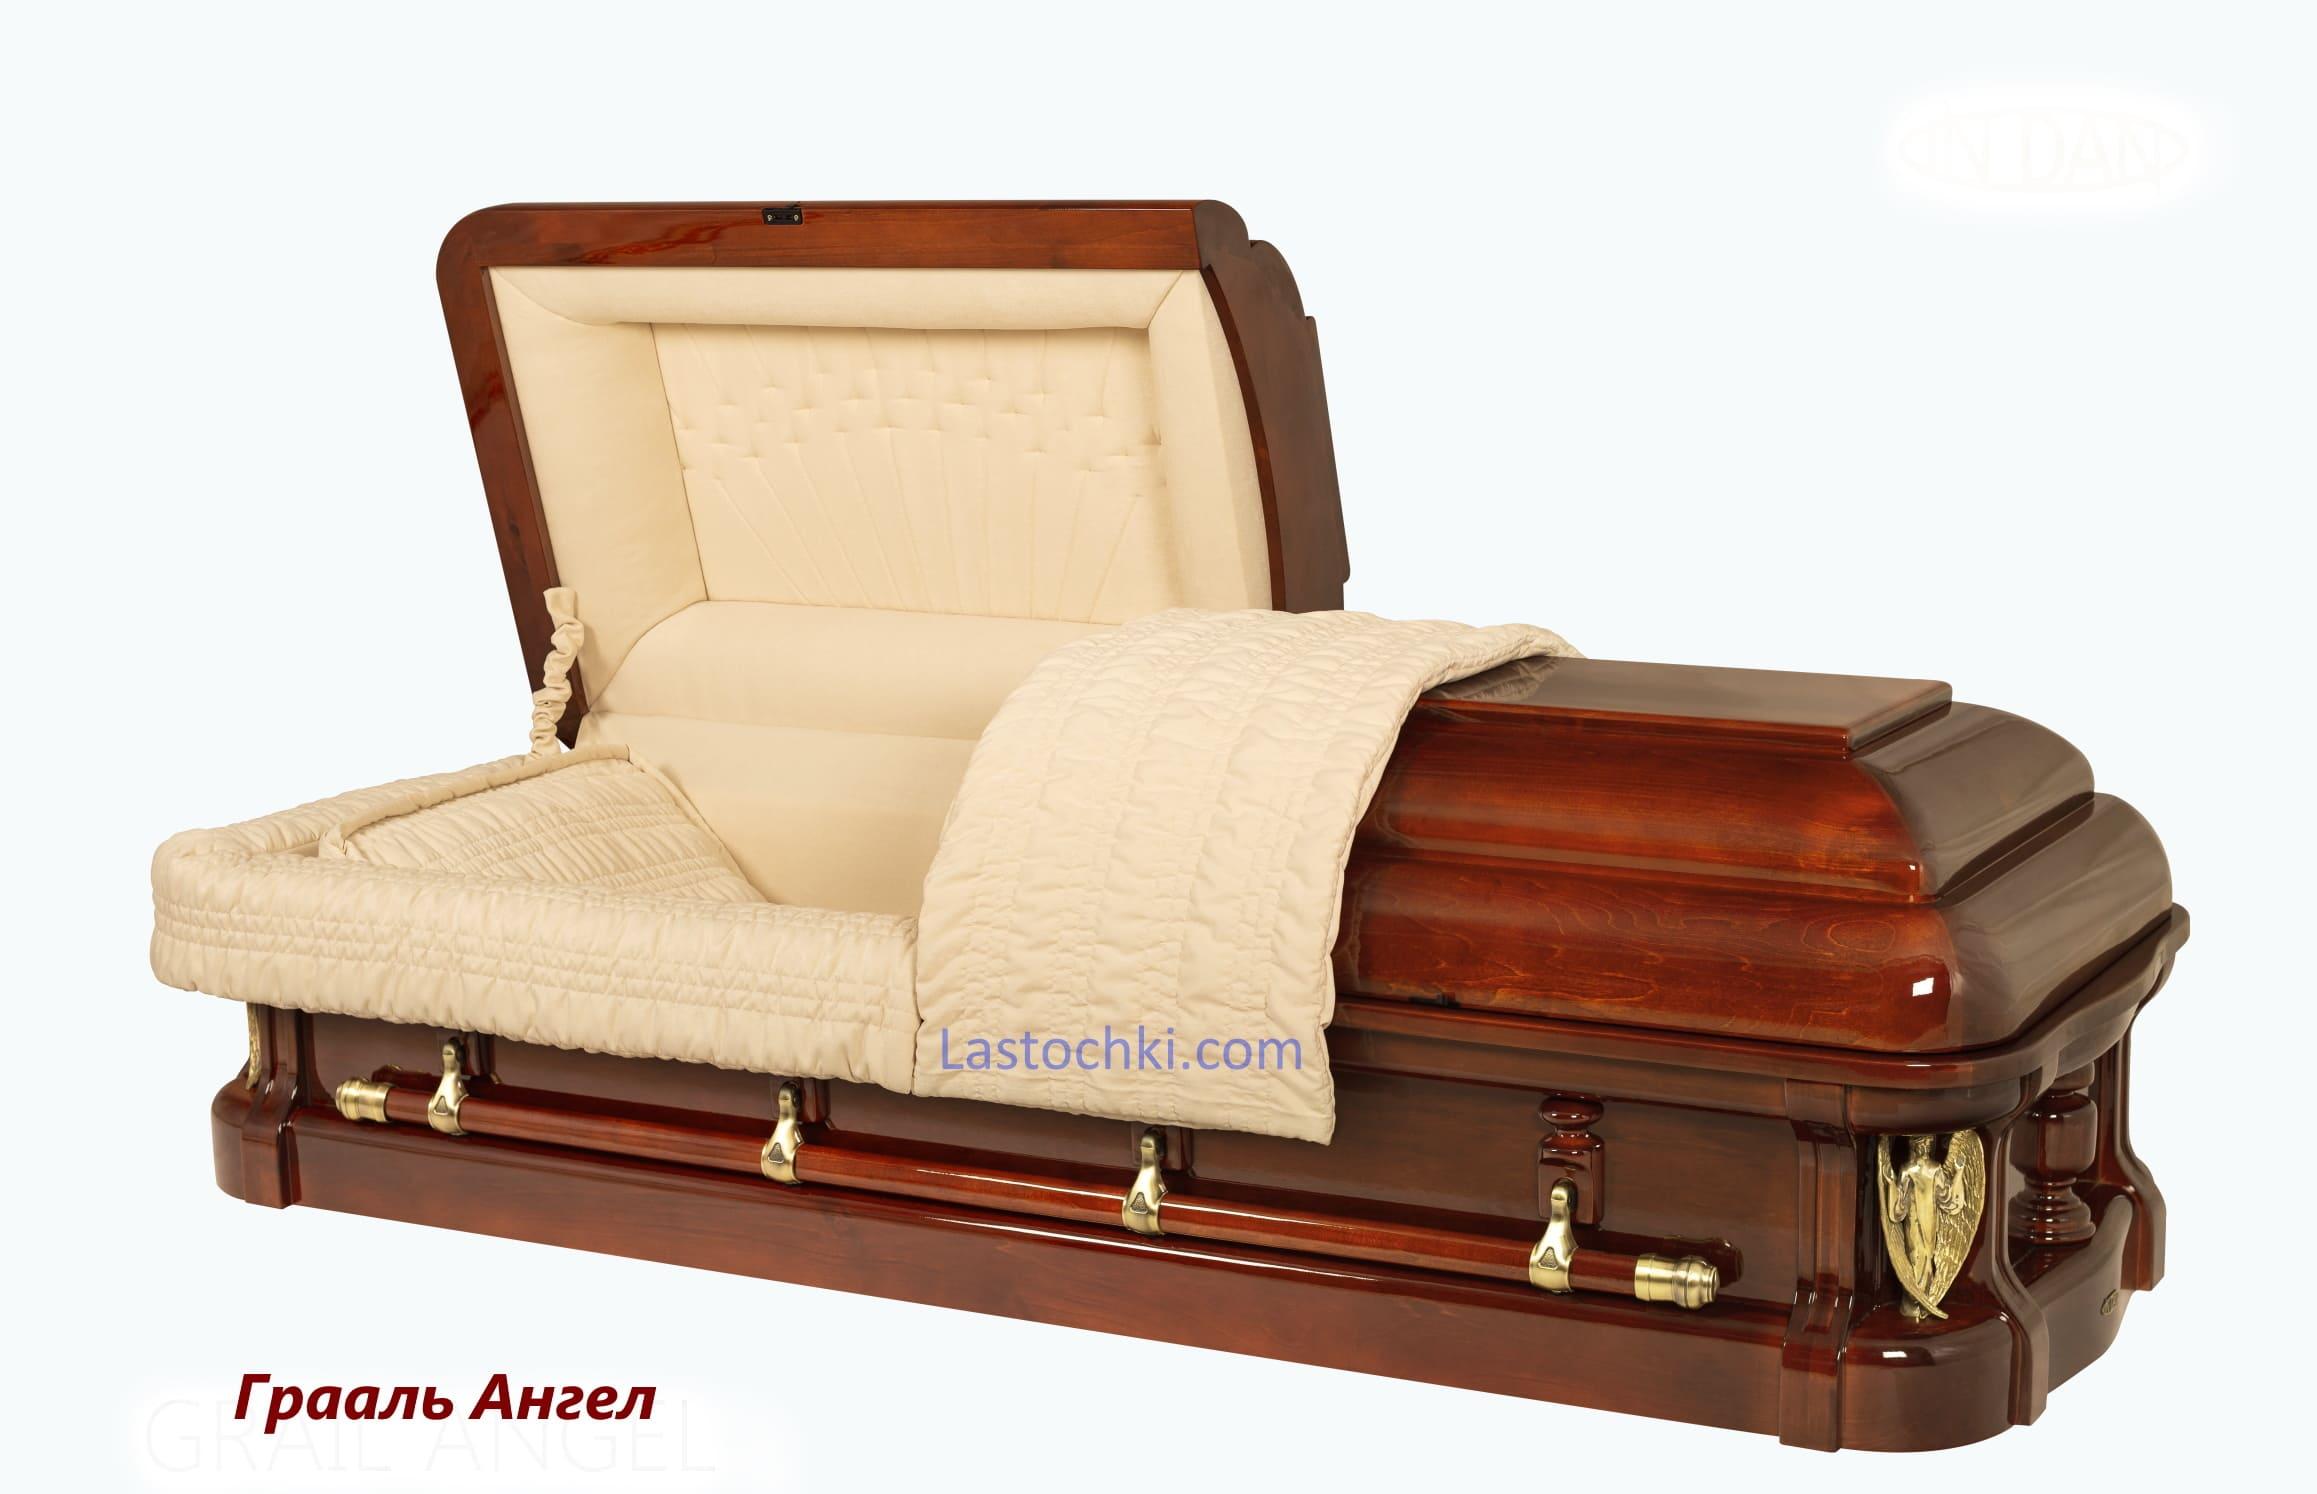 Саркофаг Ангел - Цена 600 000 грн.